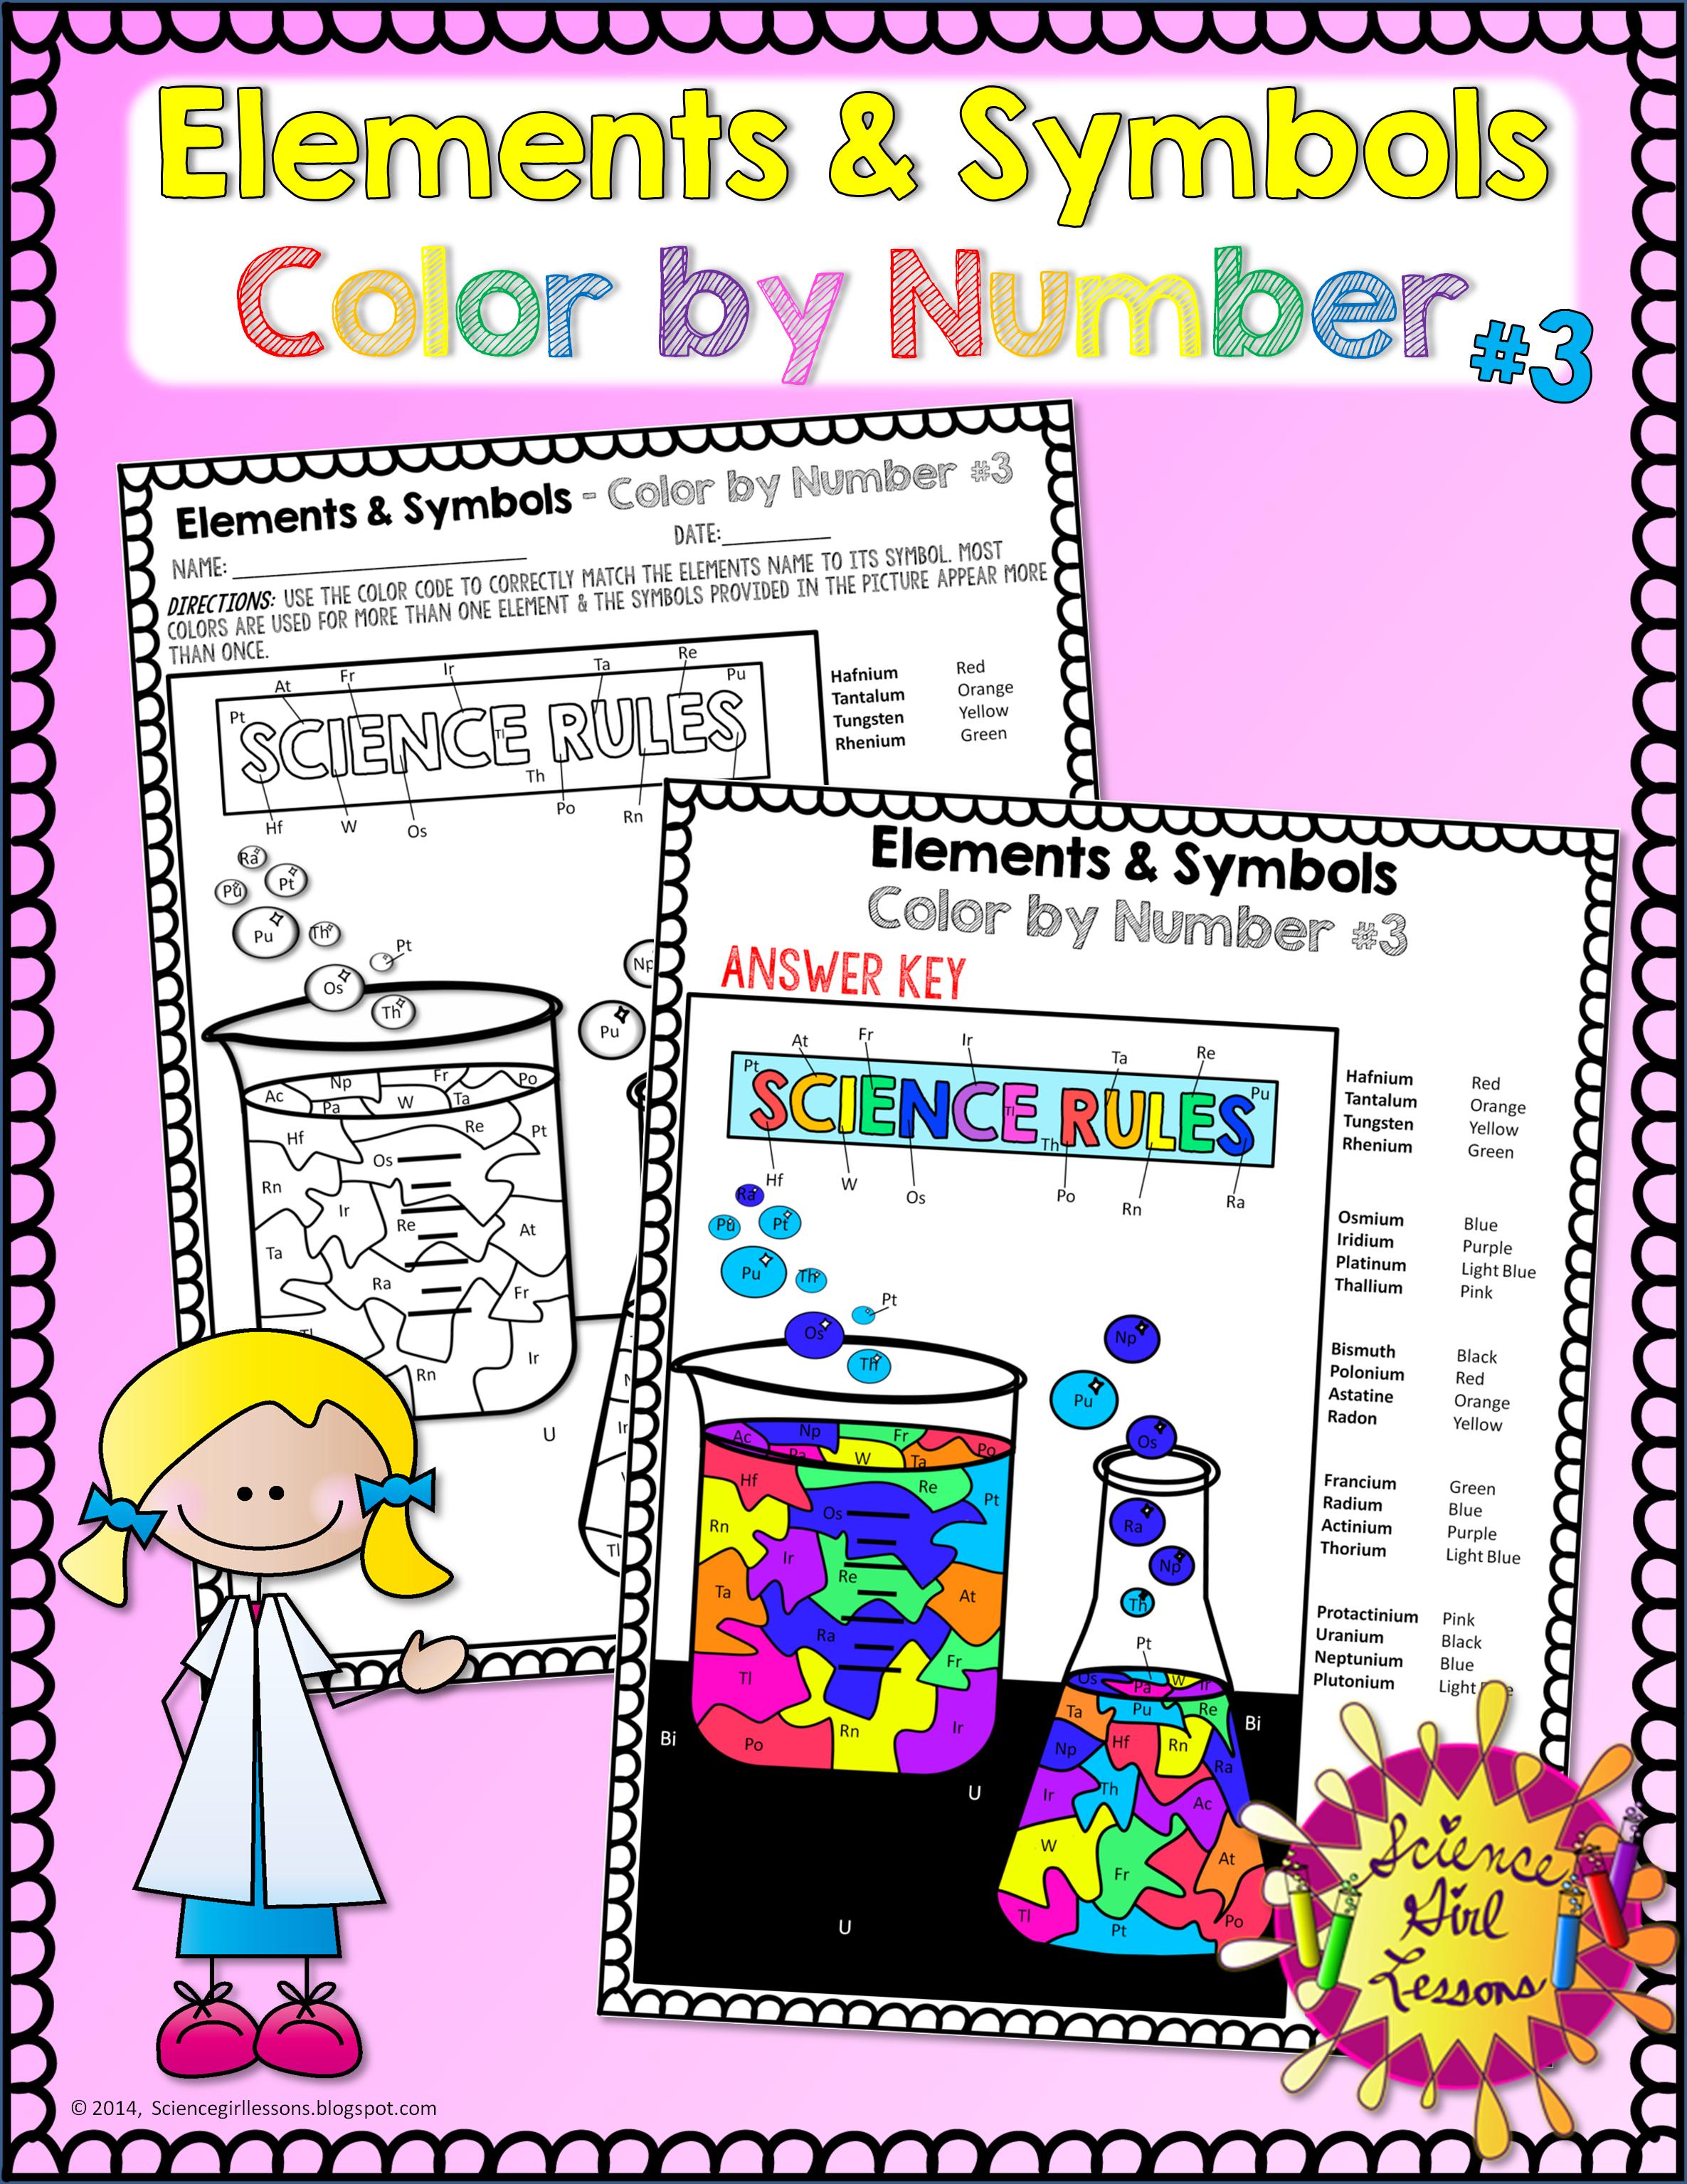 Chemical Elements - Color by Symbols #3 | TpT Science